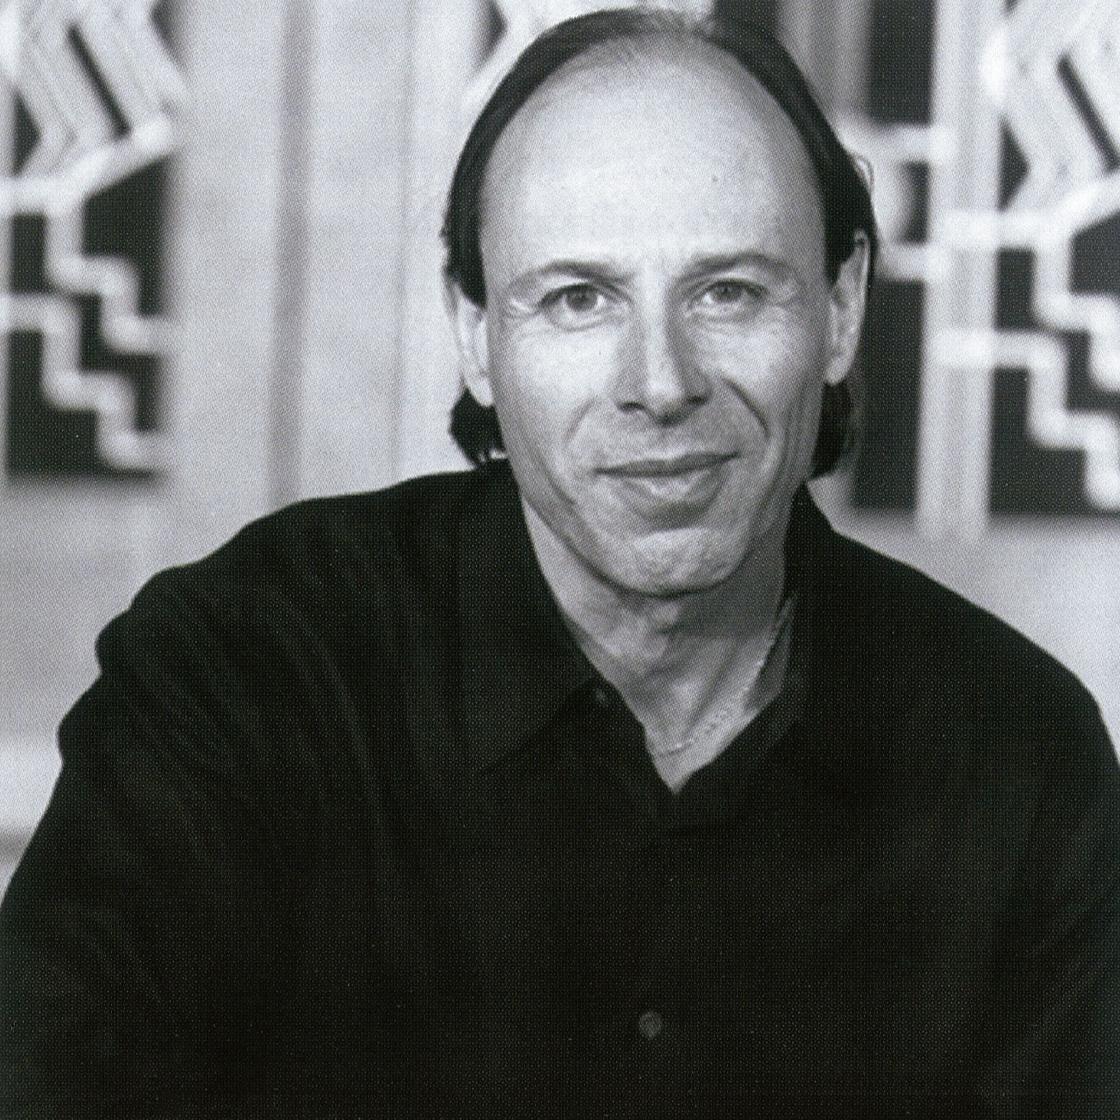 Mark-Zimmerman.jpg